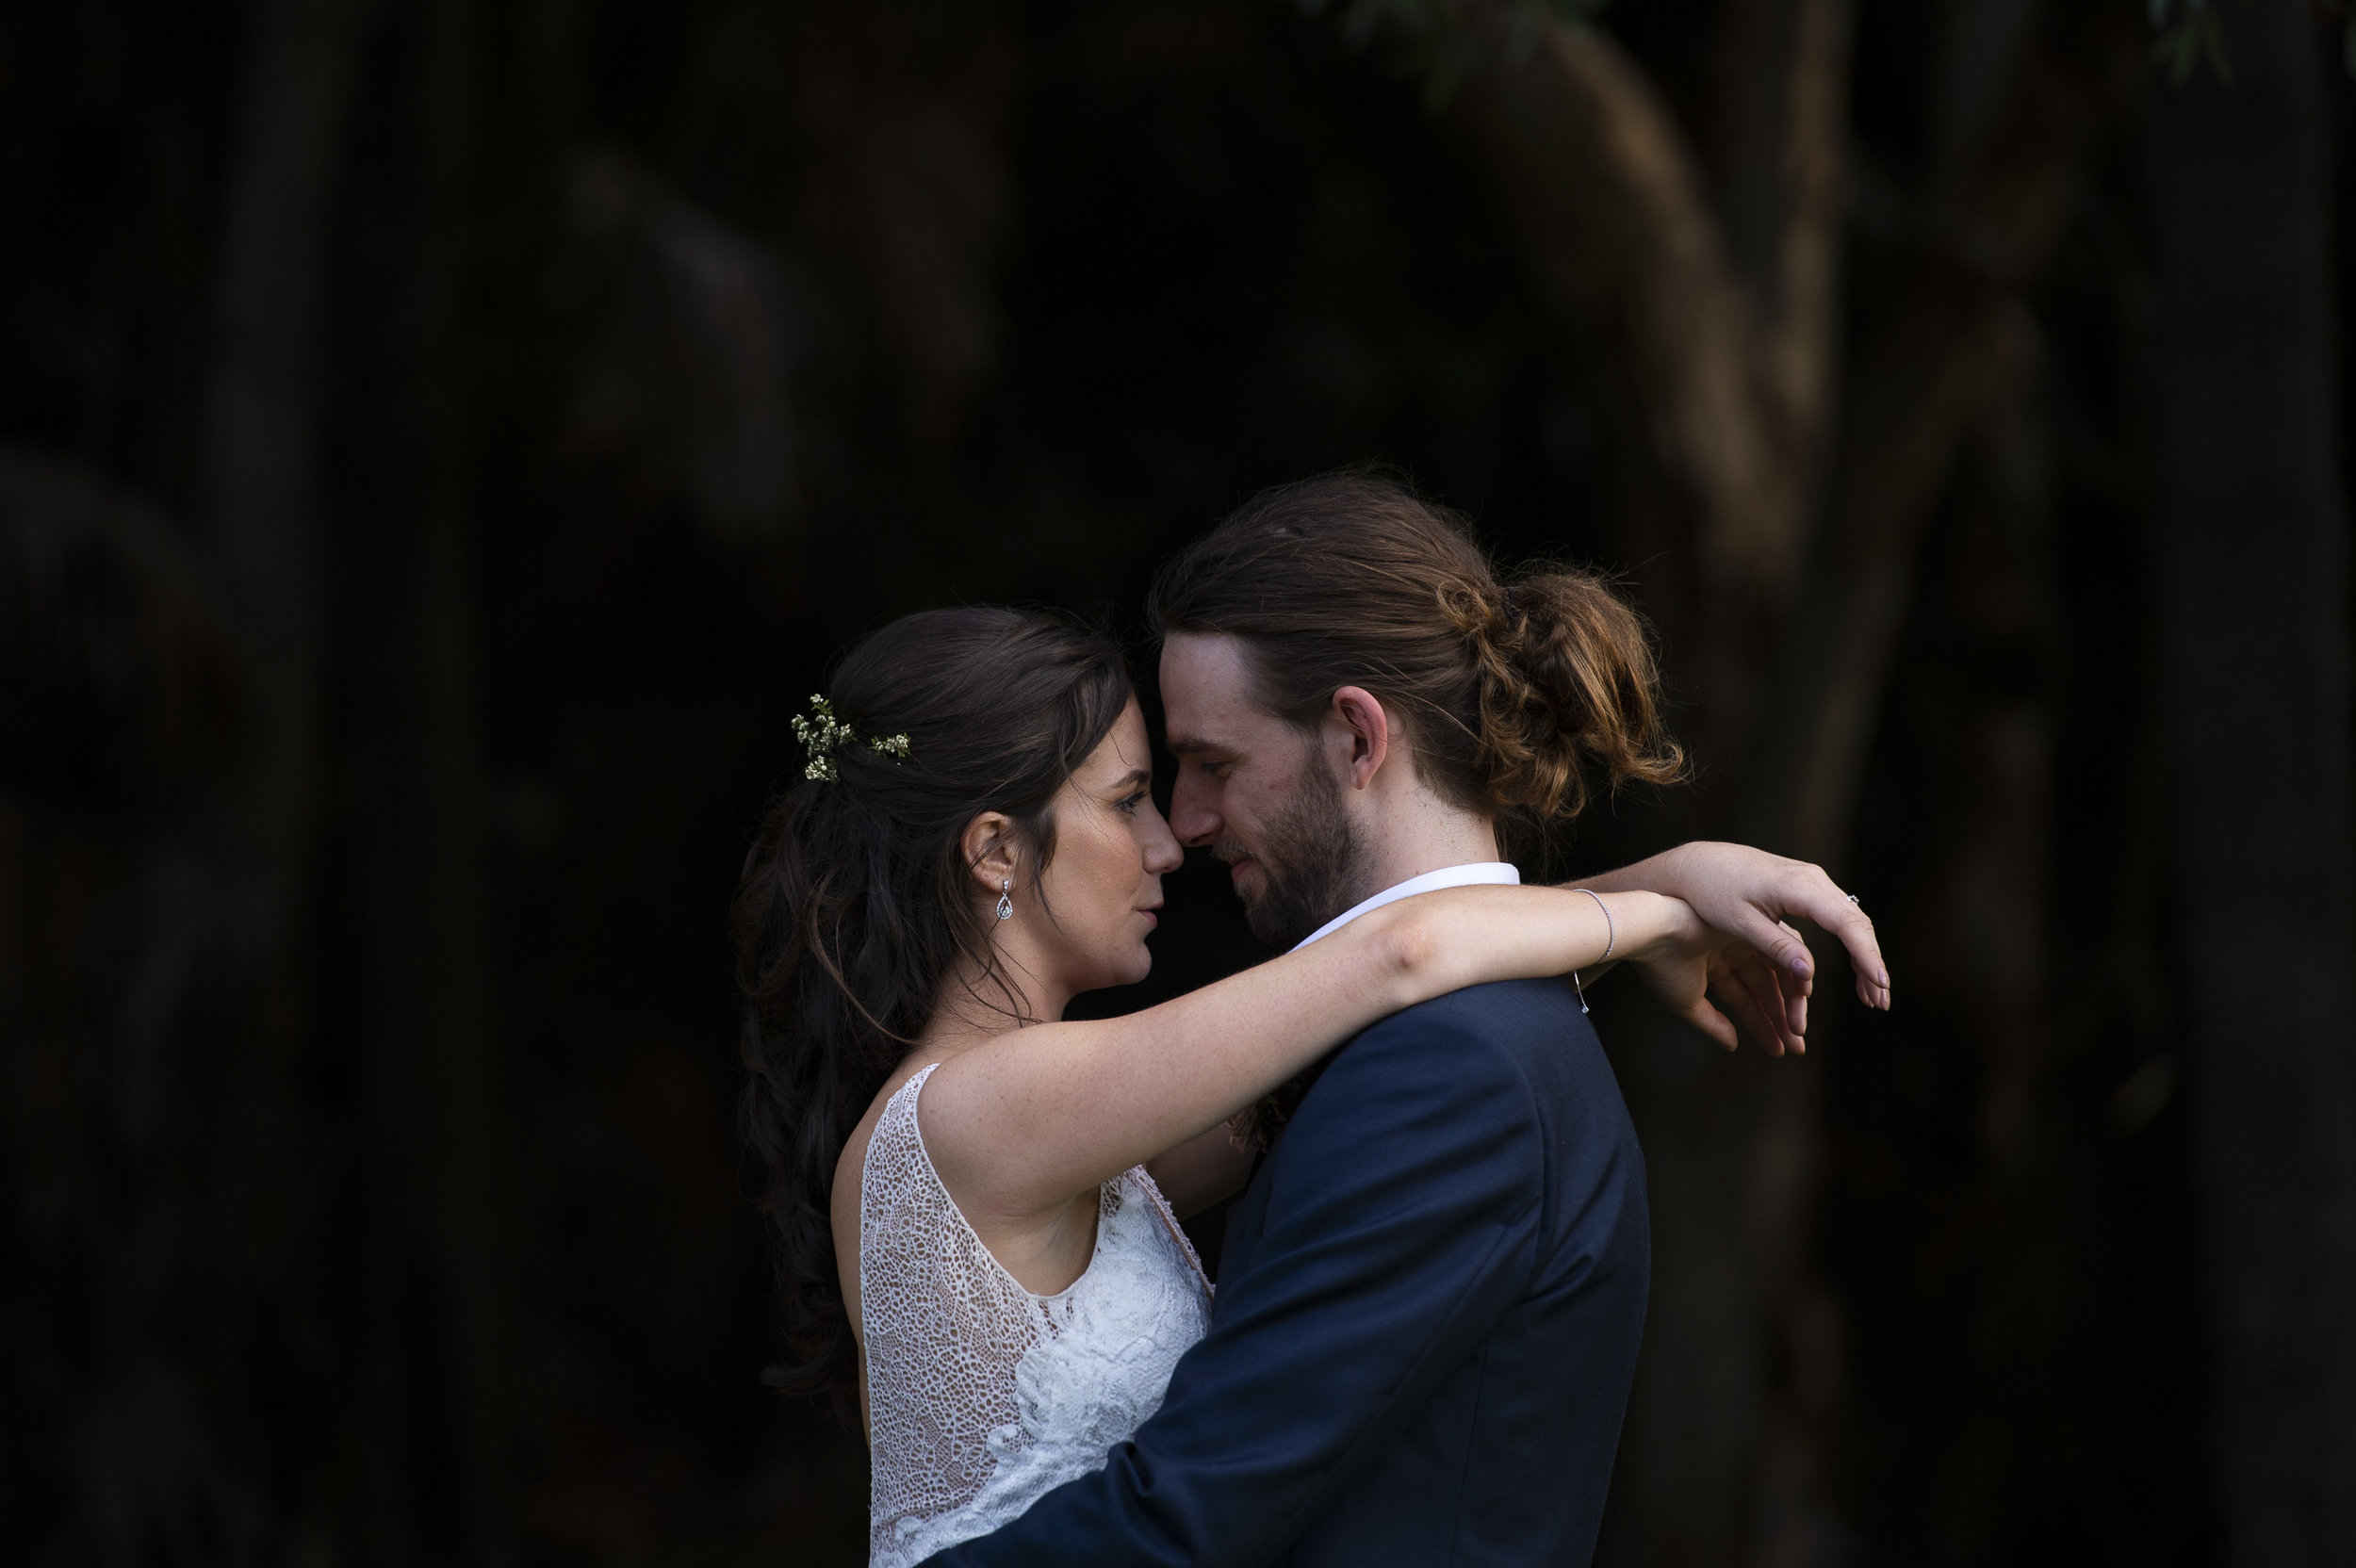 weddings by atelier photography-wedding-26.jpg